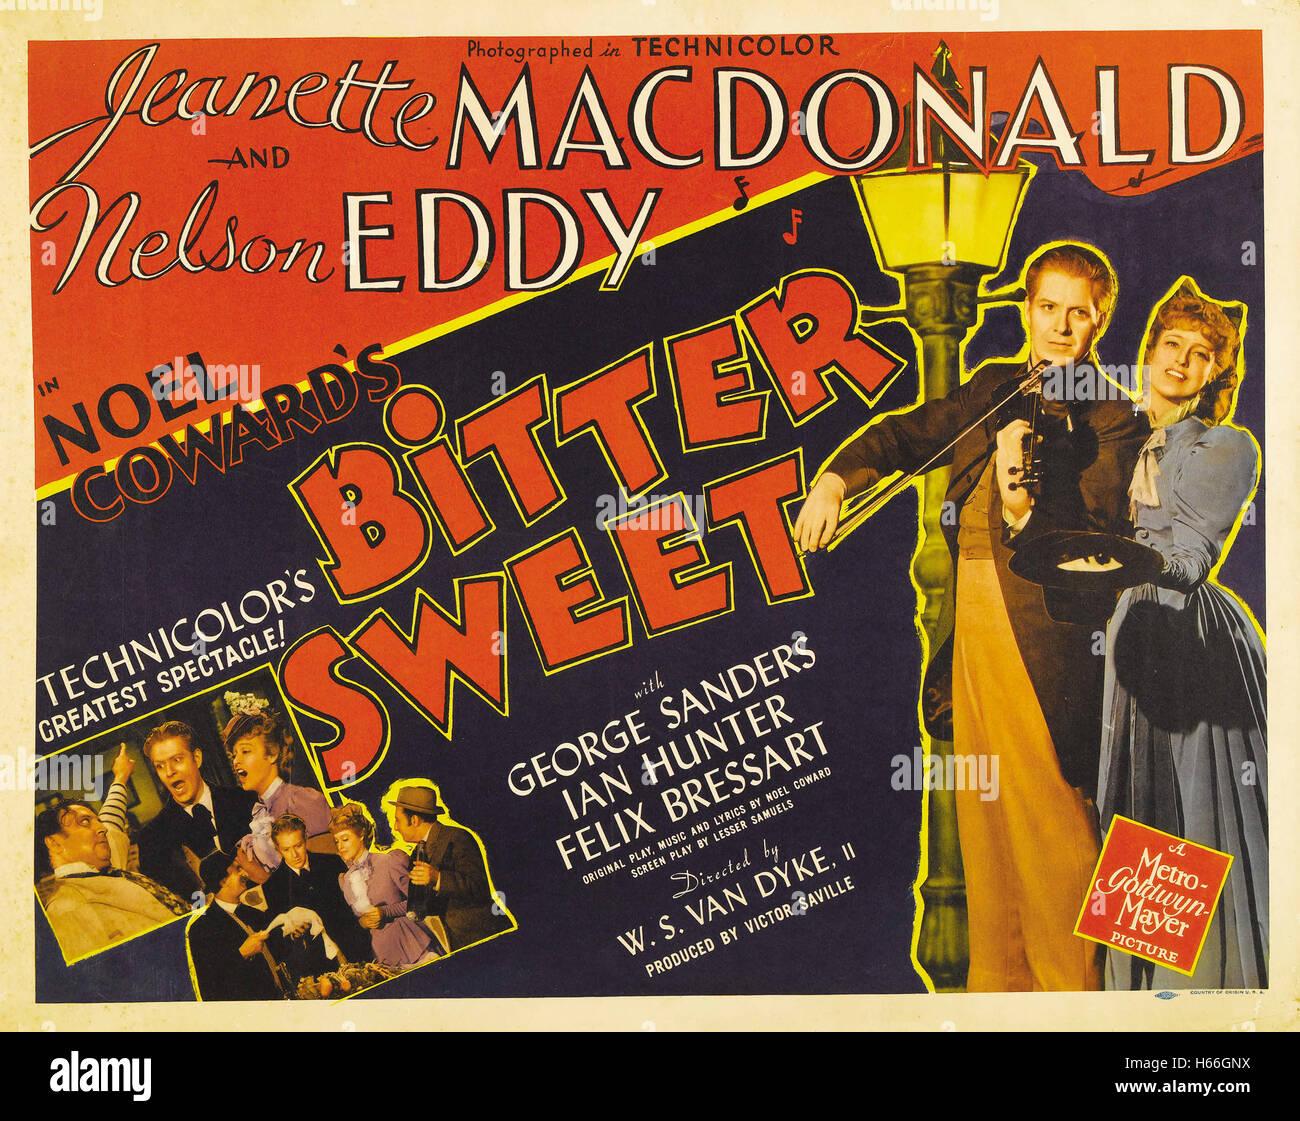 Bitter Sweet (1940) - Movie Poster - - Stock Image